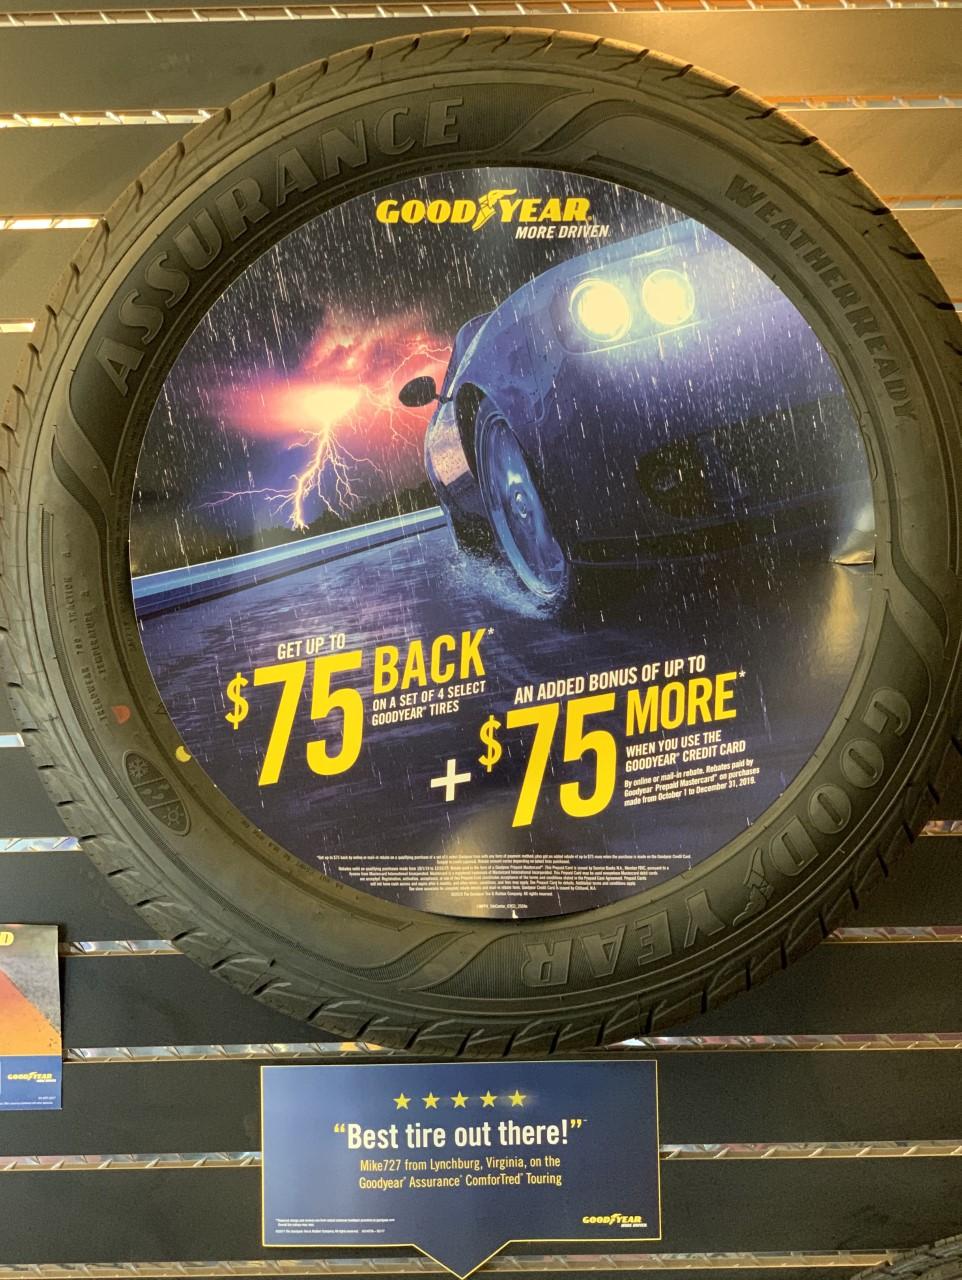 NEW Goodyear Tire Rebates: 10/1-12/31/2019